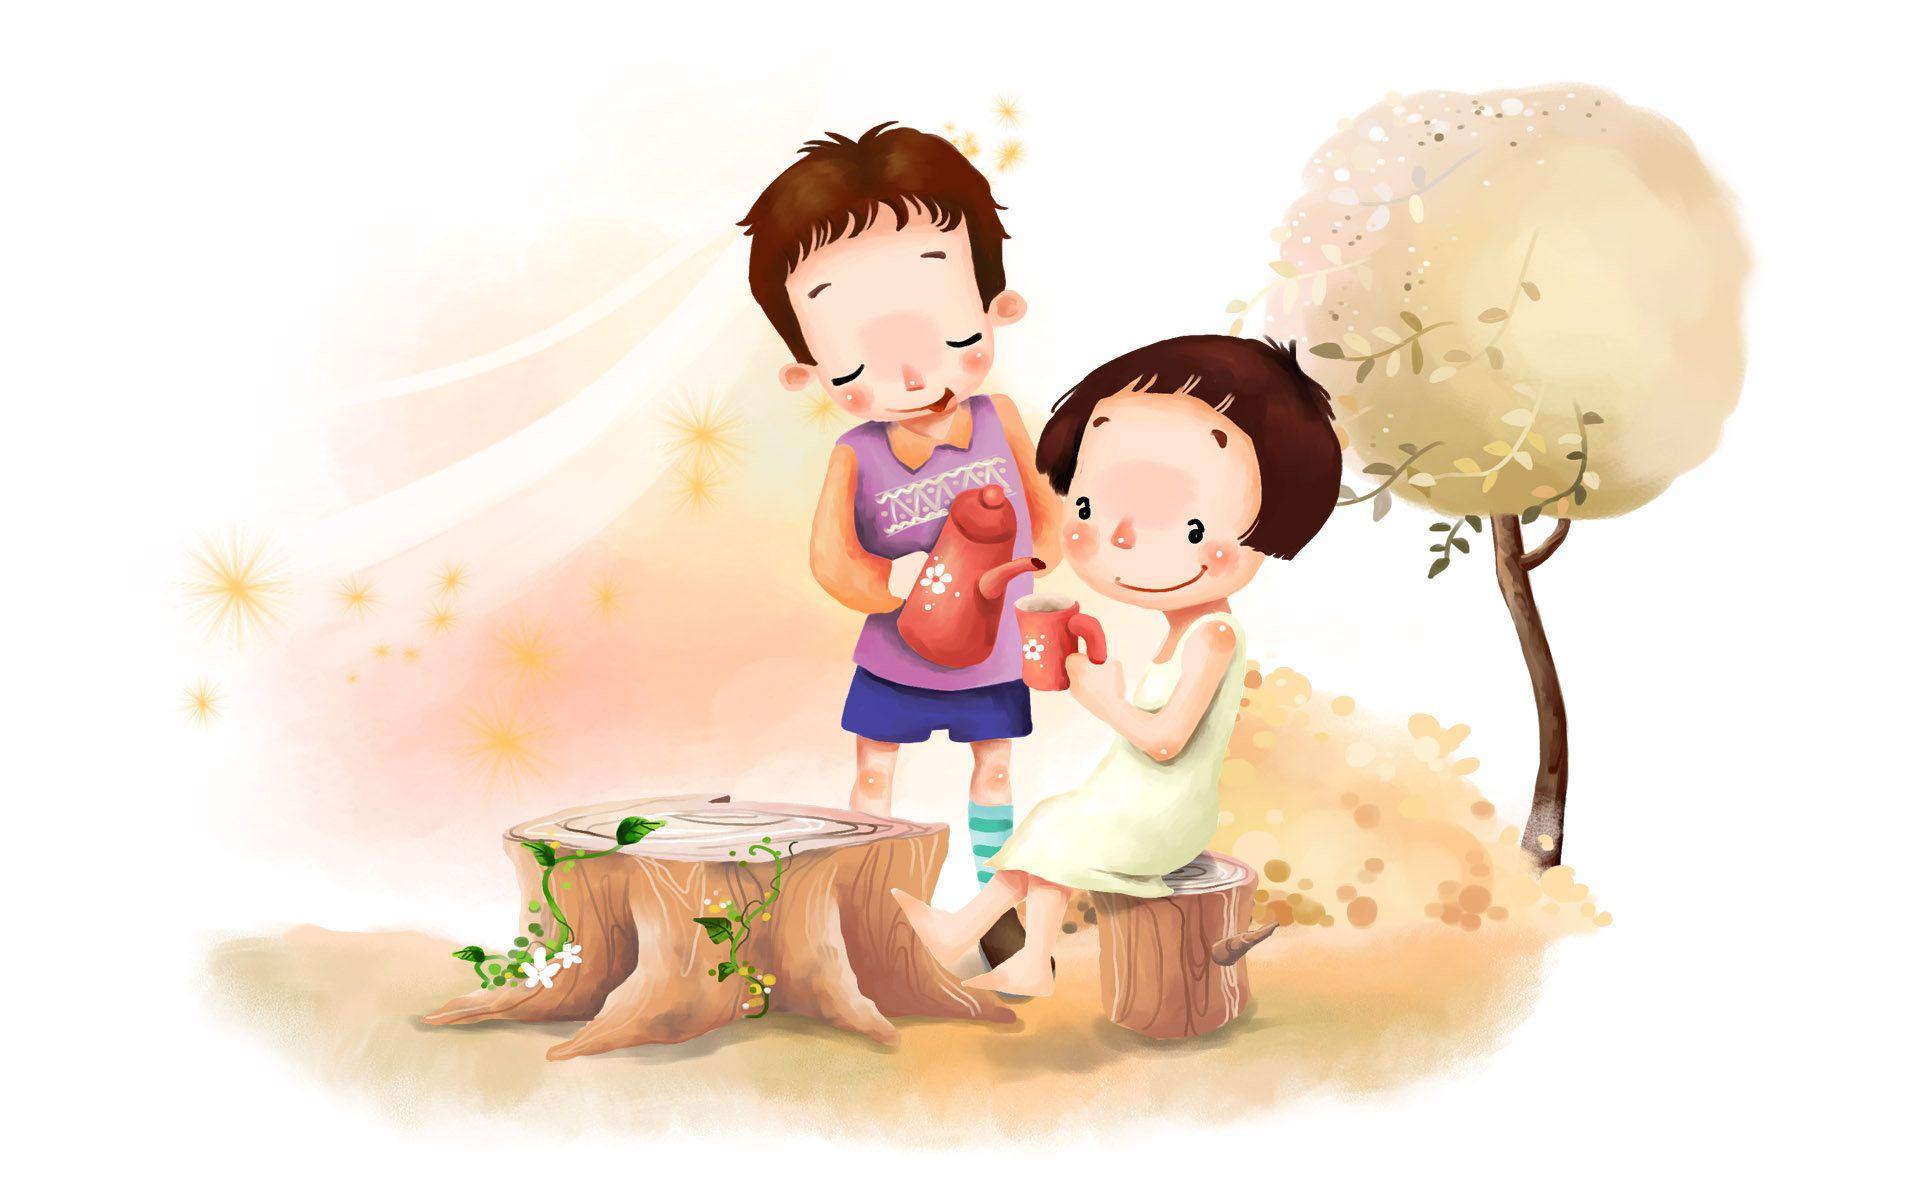 Love Couple Cute Cartoon Theme Wallpaper HD Free Desktop